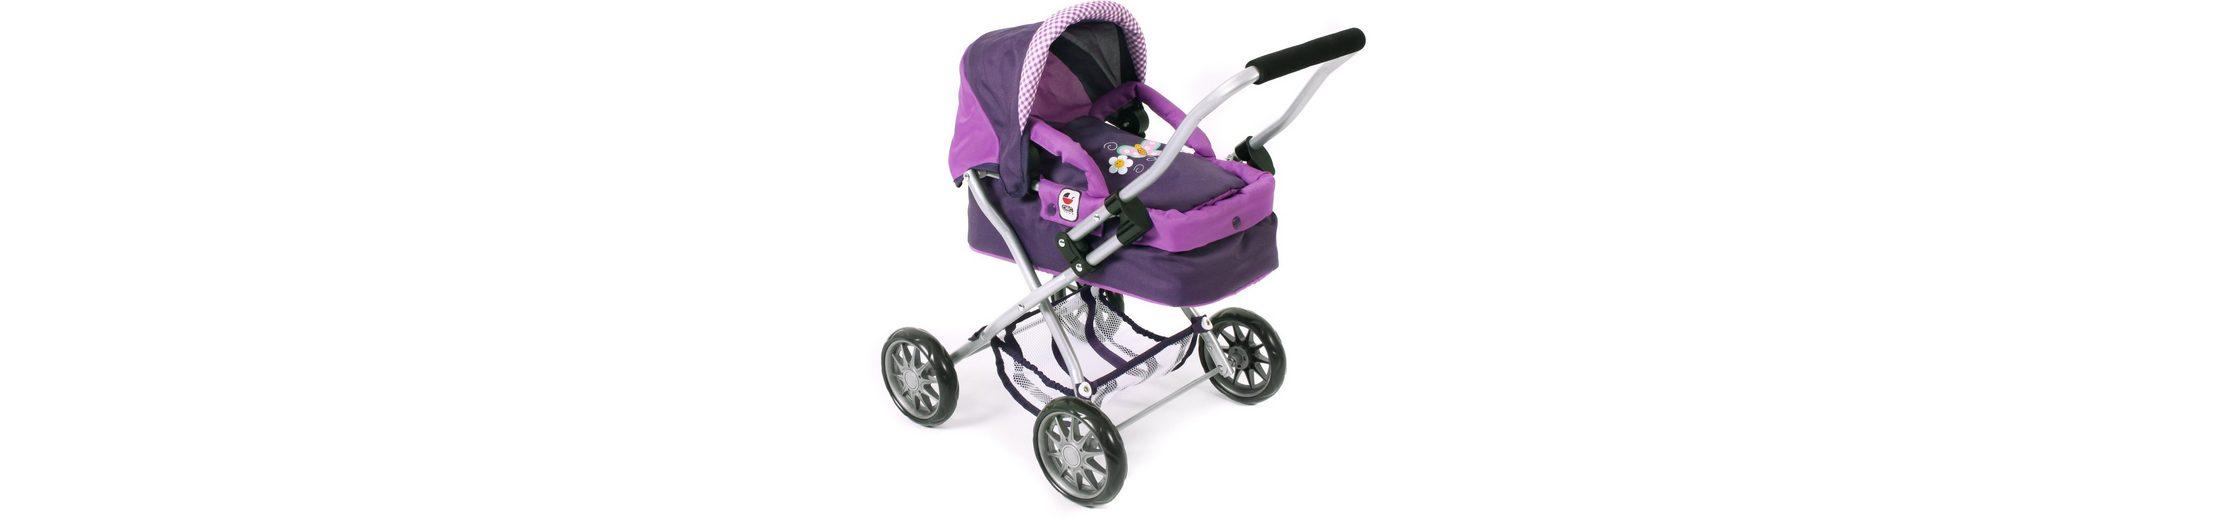 CHIC2000 Mini Puppenwagen mit herausnehmbarer Tragetasche, »Smarty purple«